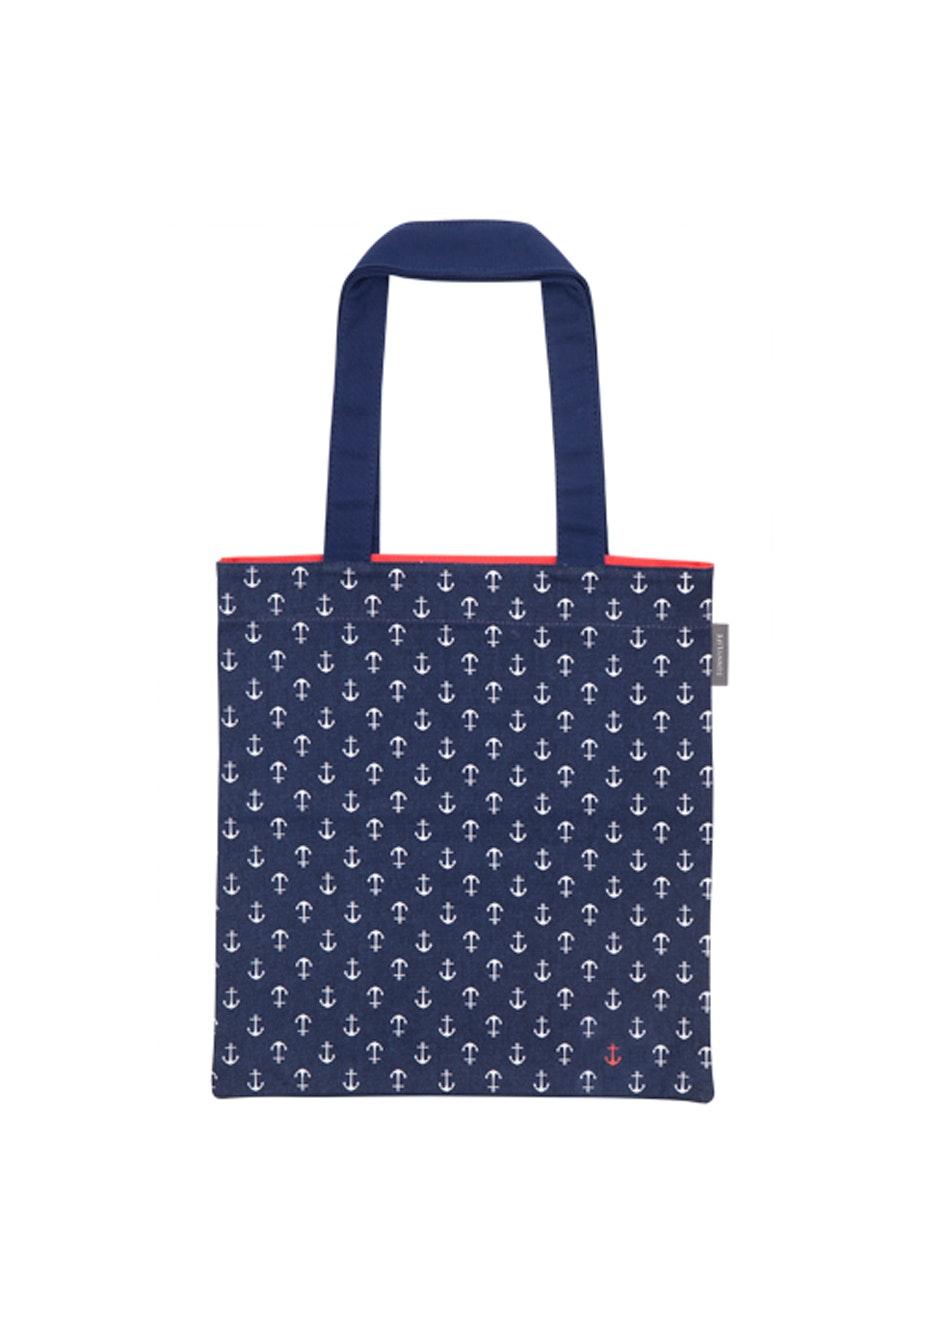 Sunnylife - Tote Bag - Anchor